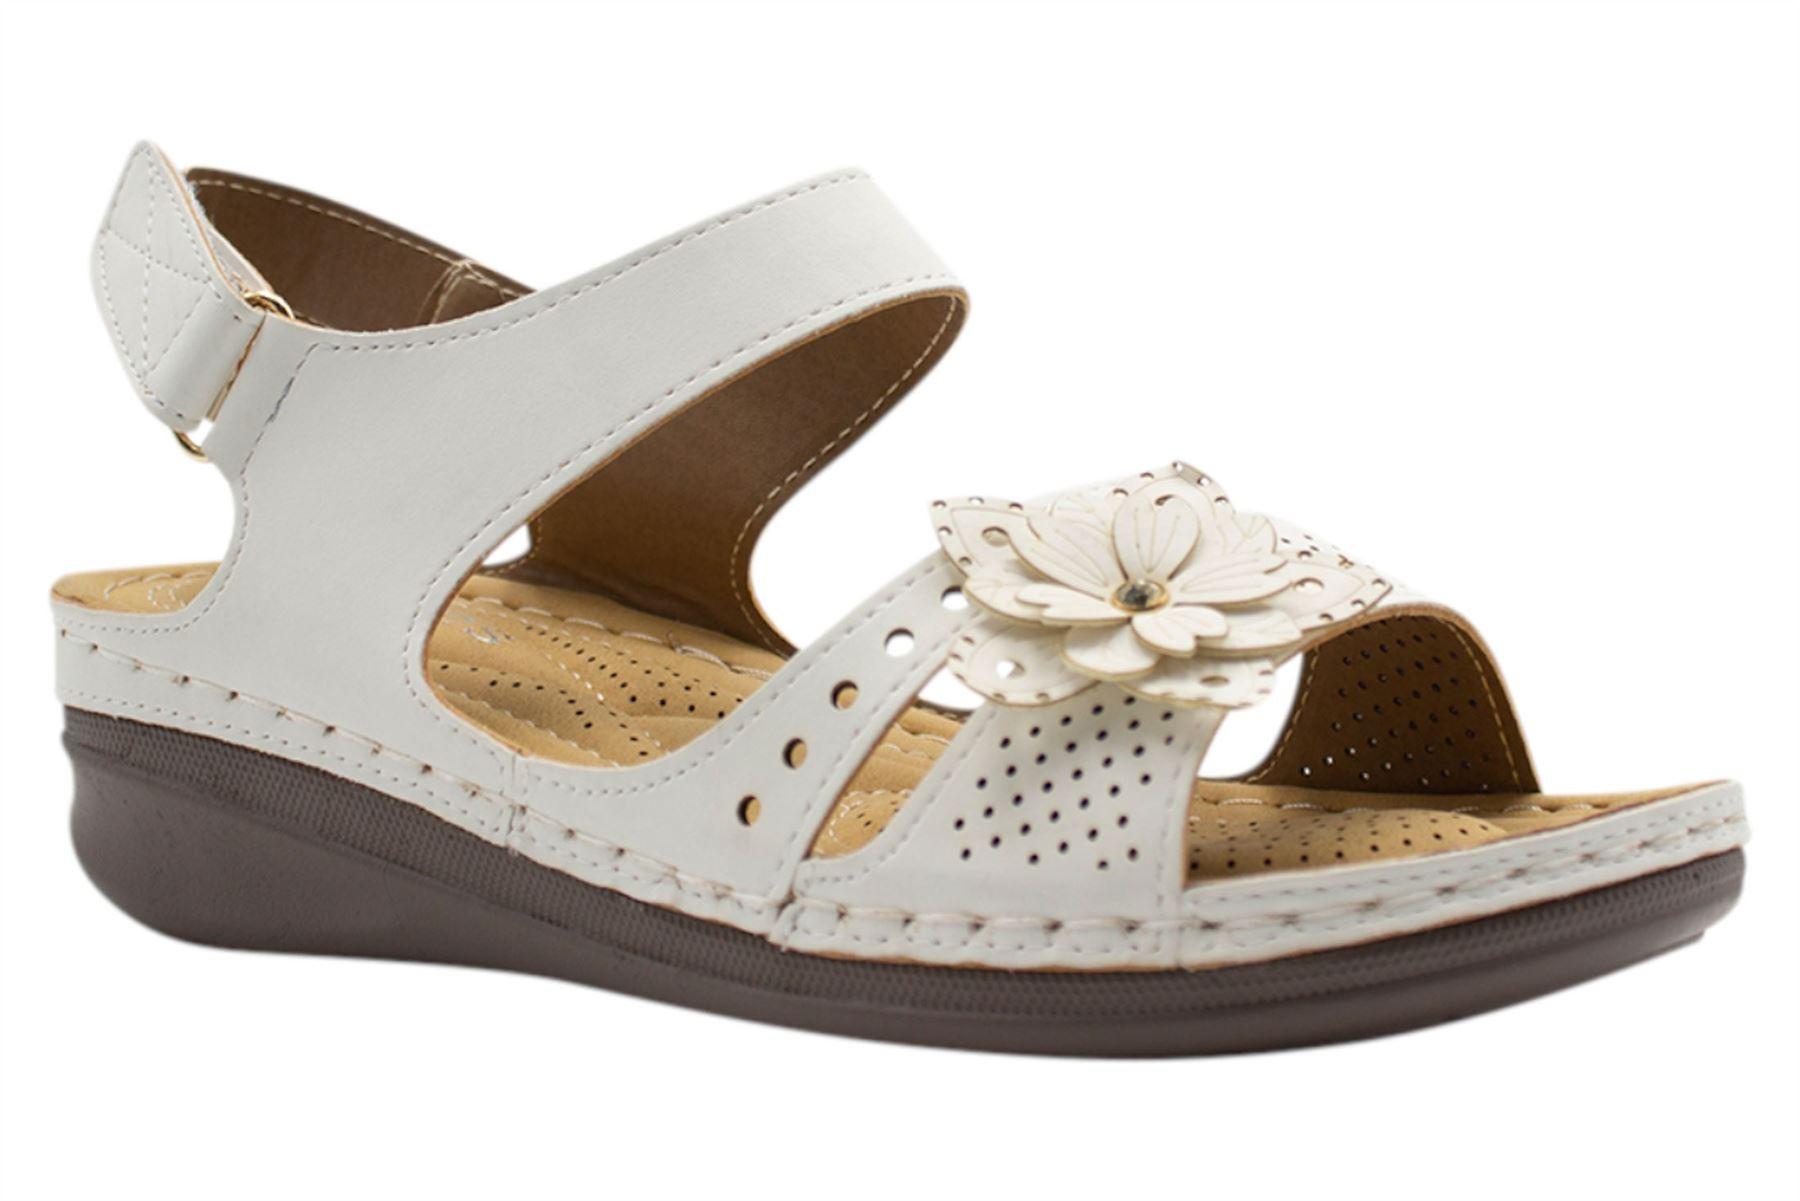 Ladies-Wedge-Heel-Sandal-Womens-Comfort-Cushion-Strapy-Summer-Shoes miniatura 41